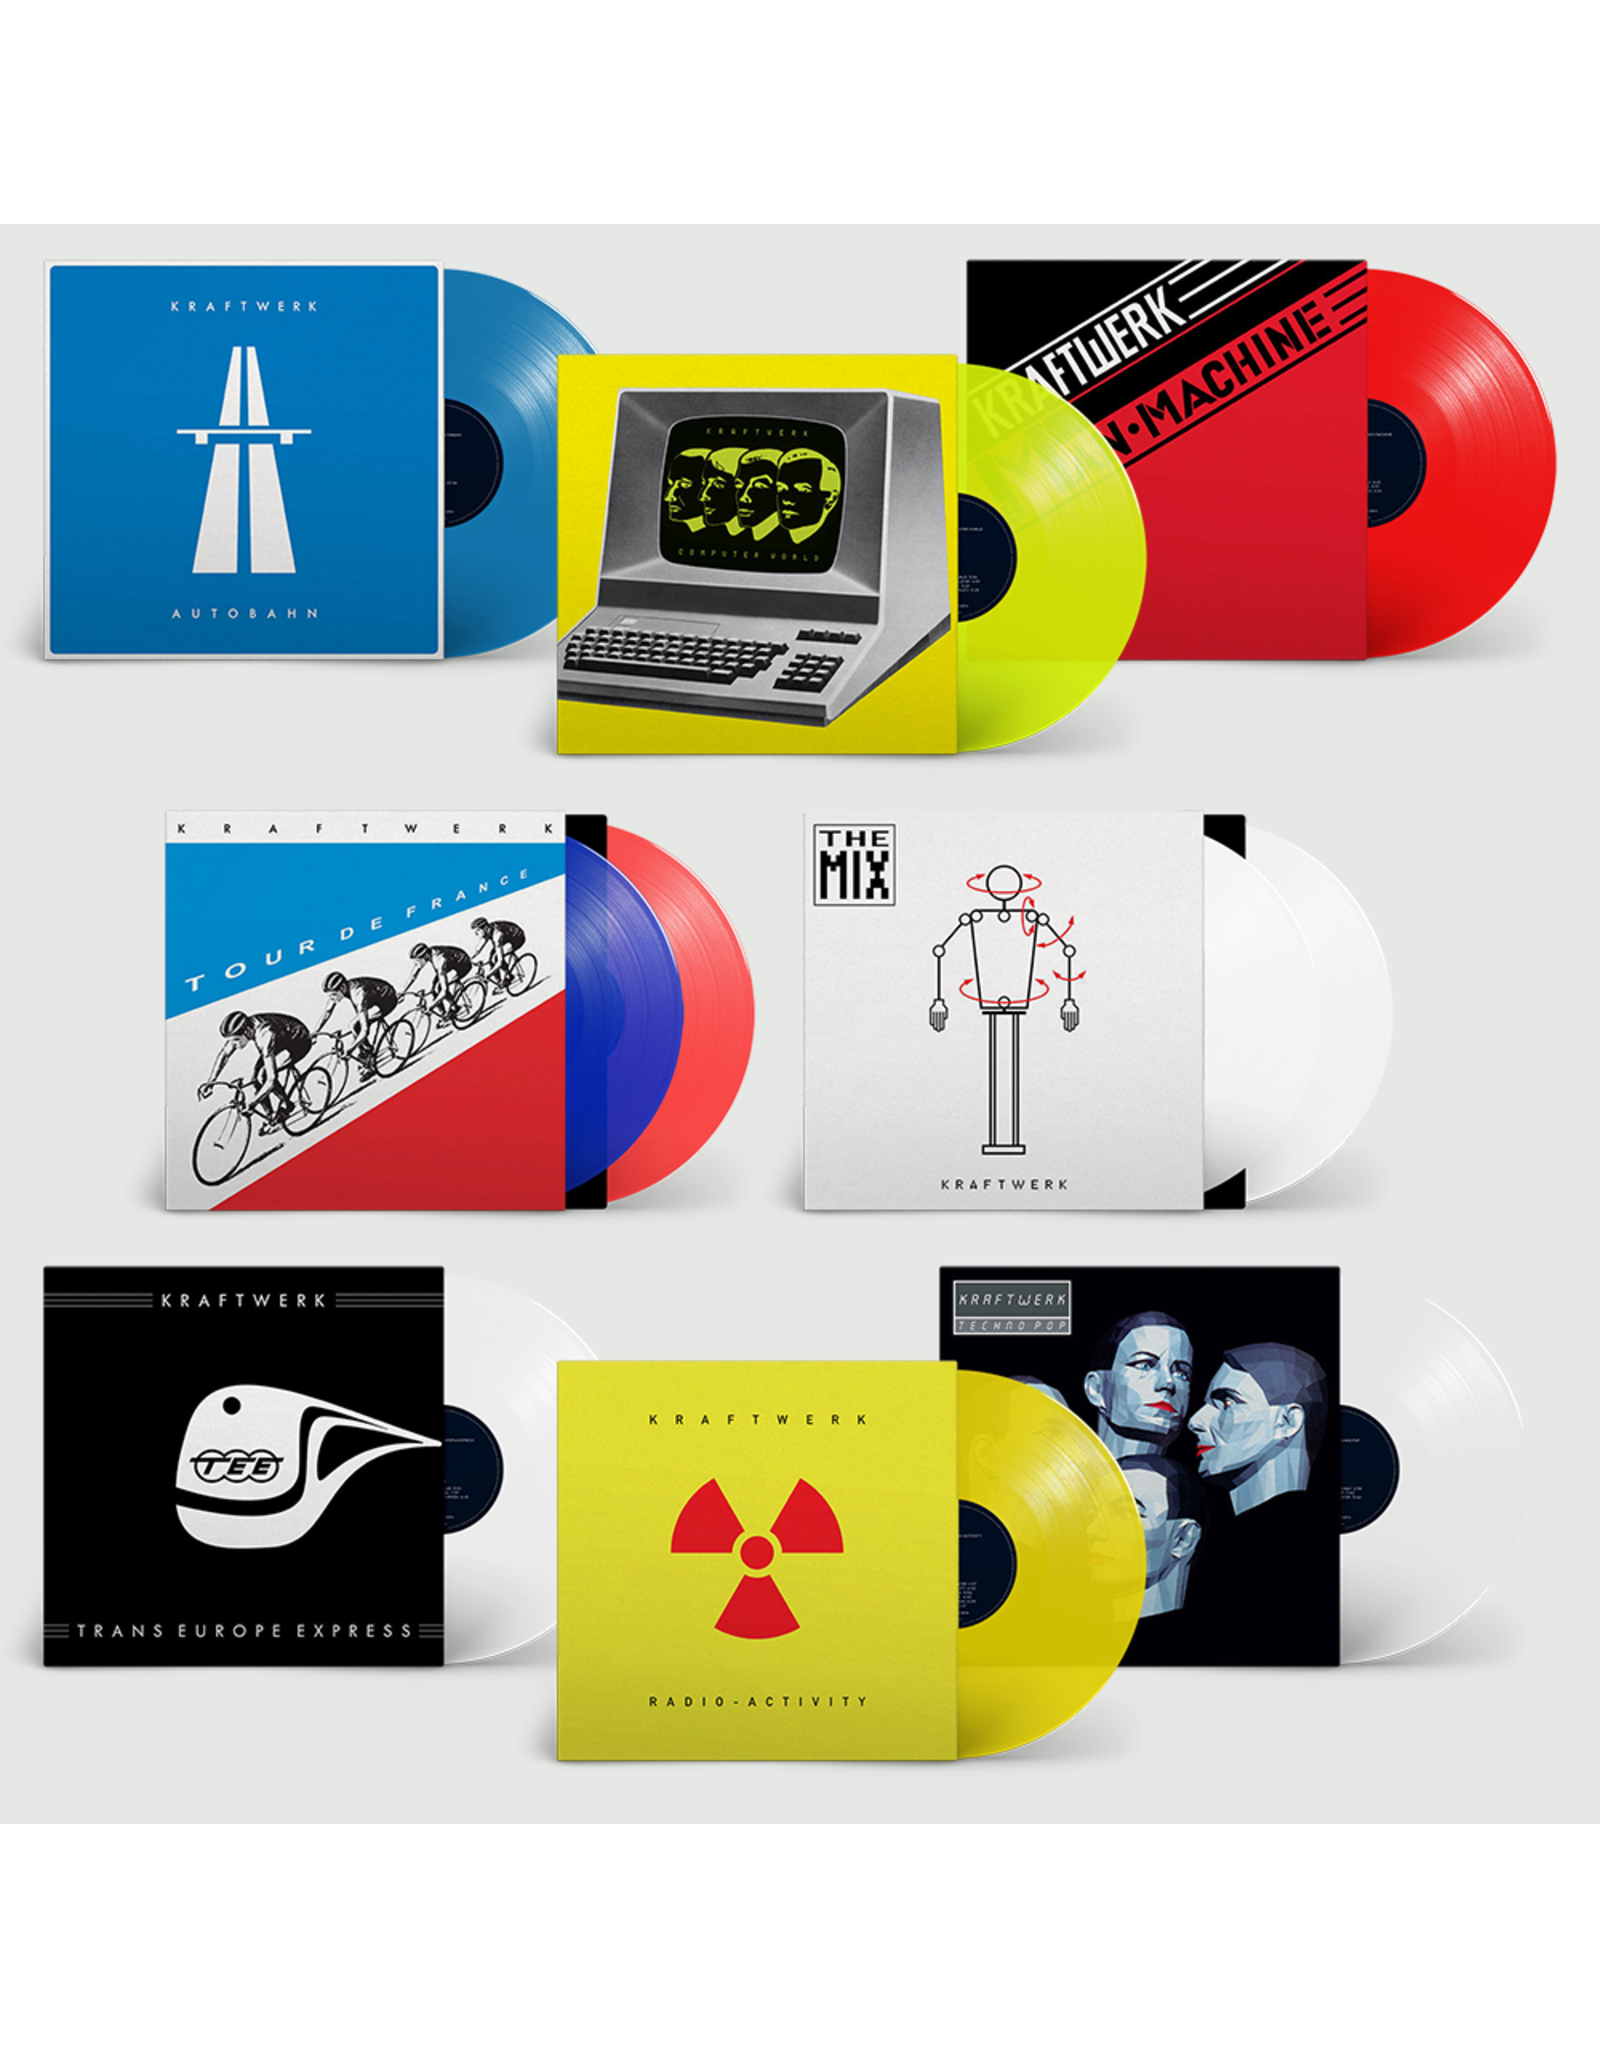 Kraftwerk - Autobahn (Blue Vinyl)